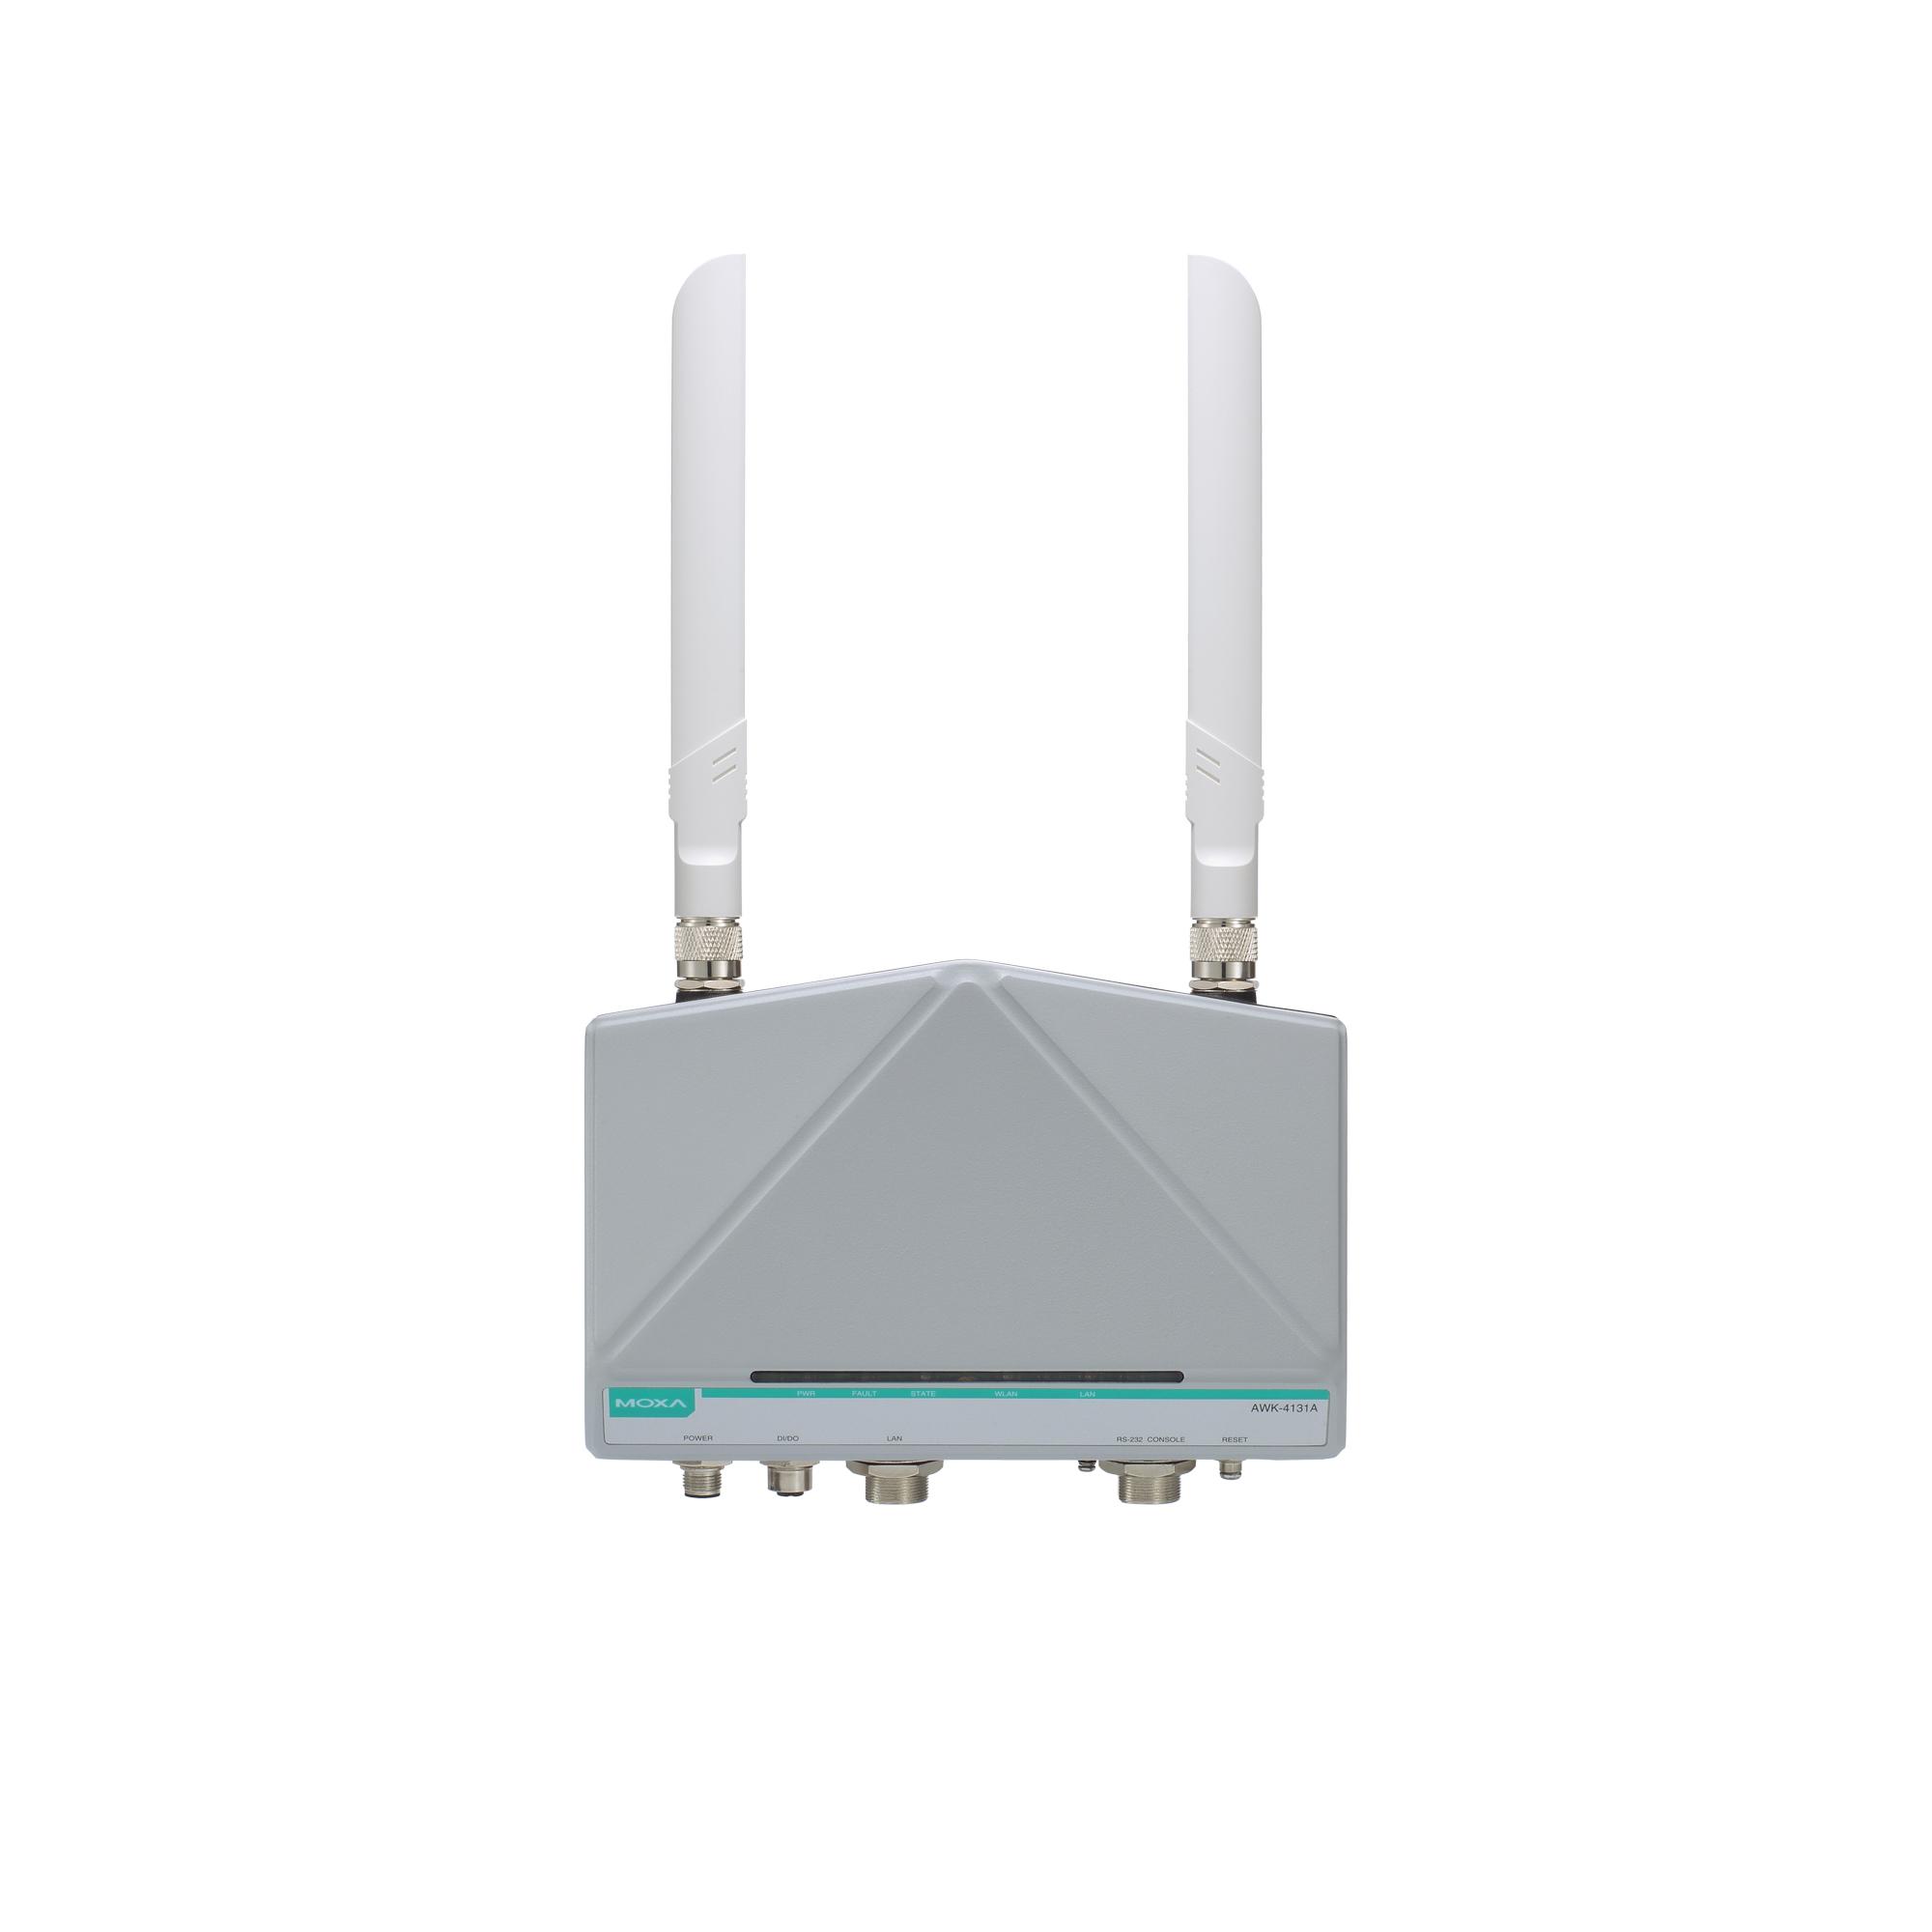 AWK-4131A Series - WLAN AP/Bridge/Client   MOXA